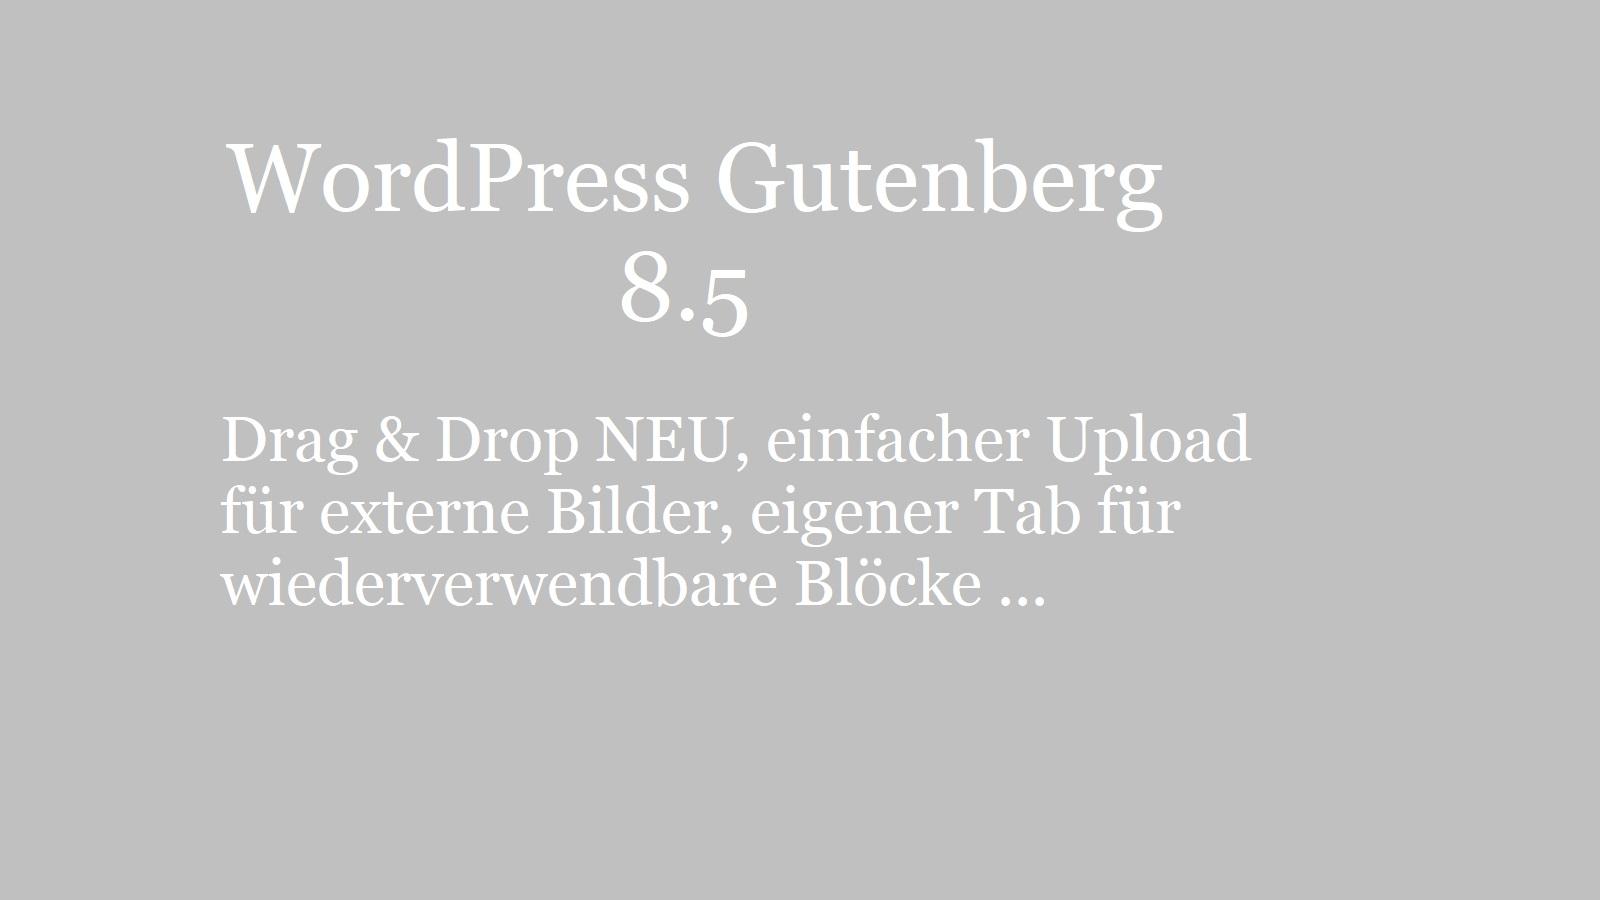 wordpress-gutenberg-8.5